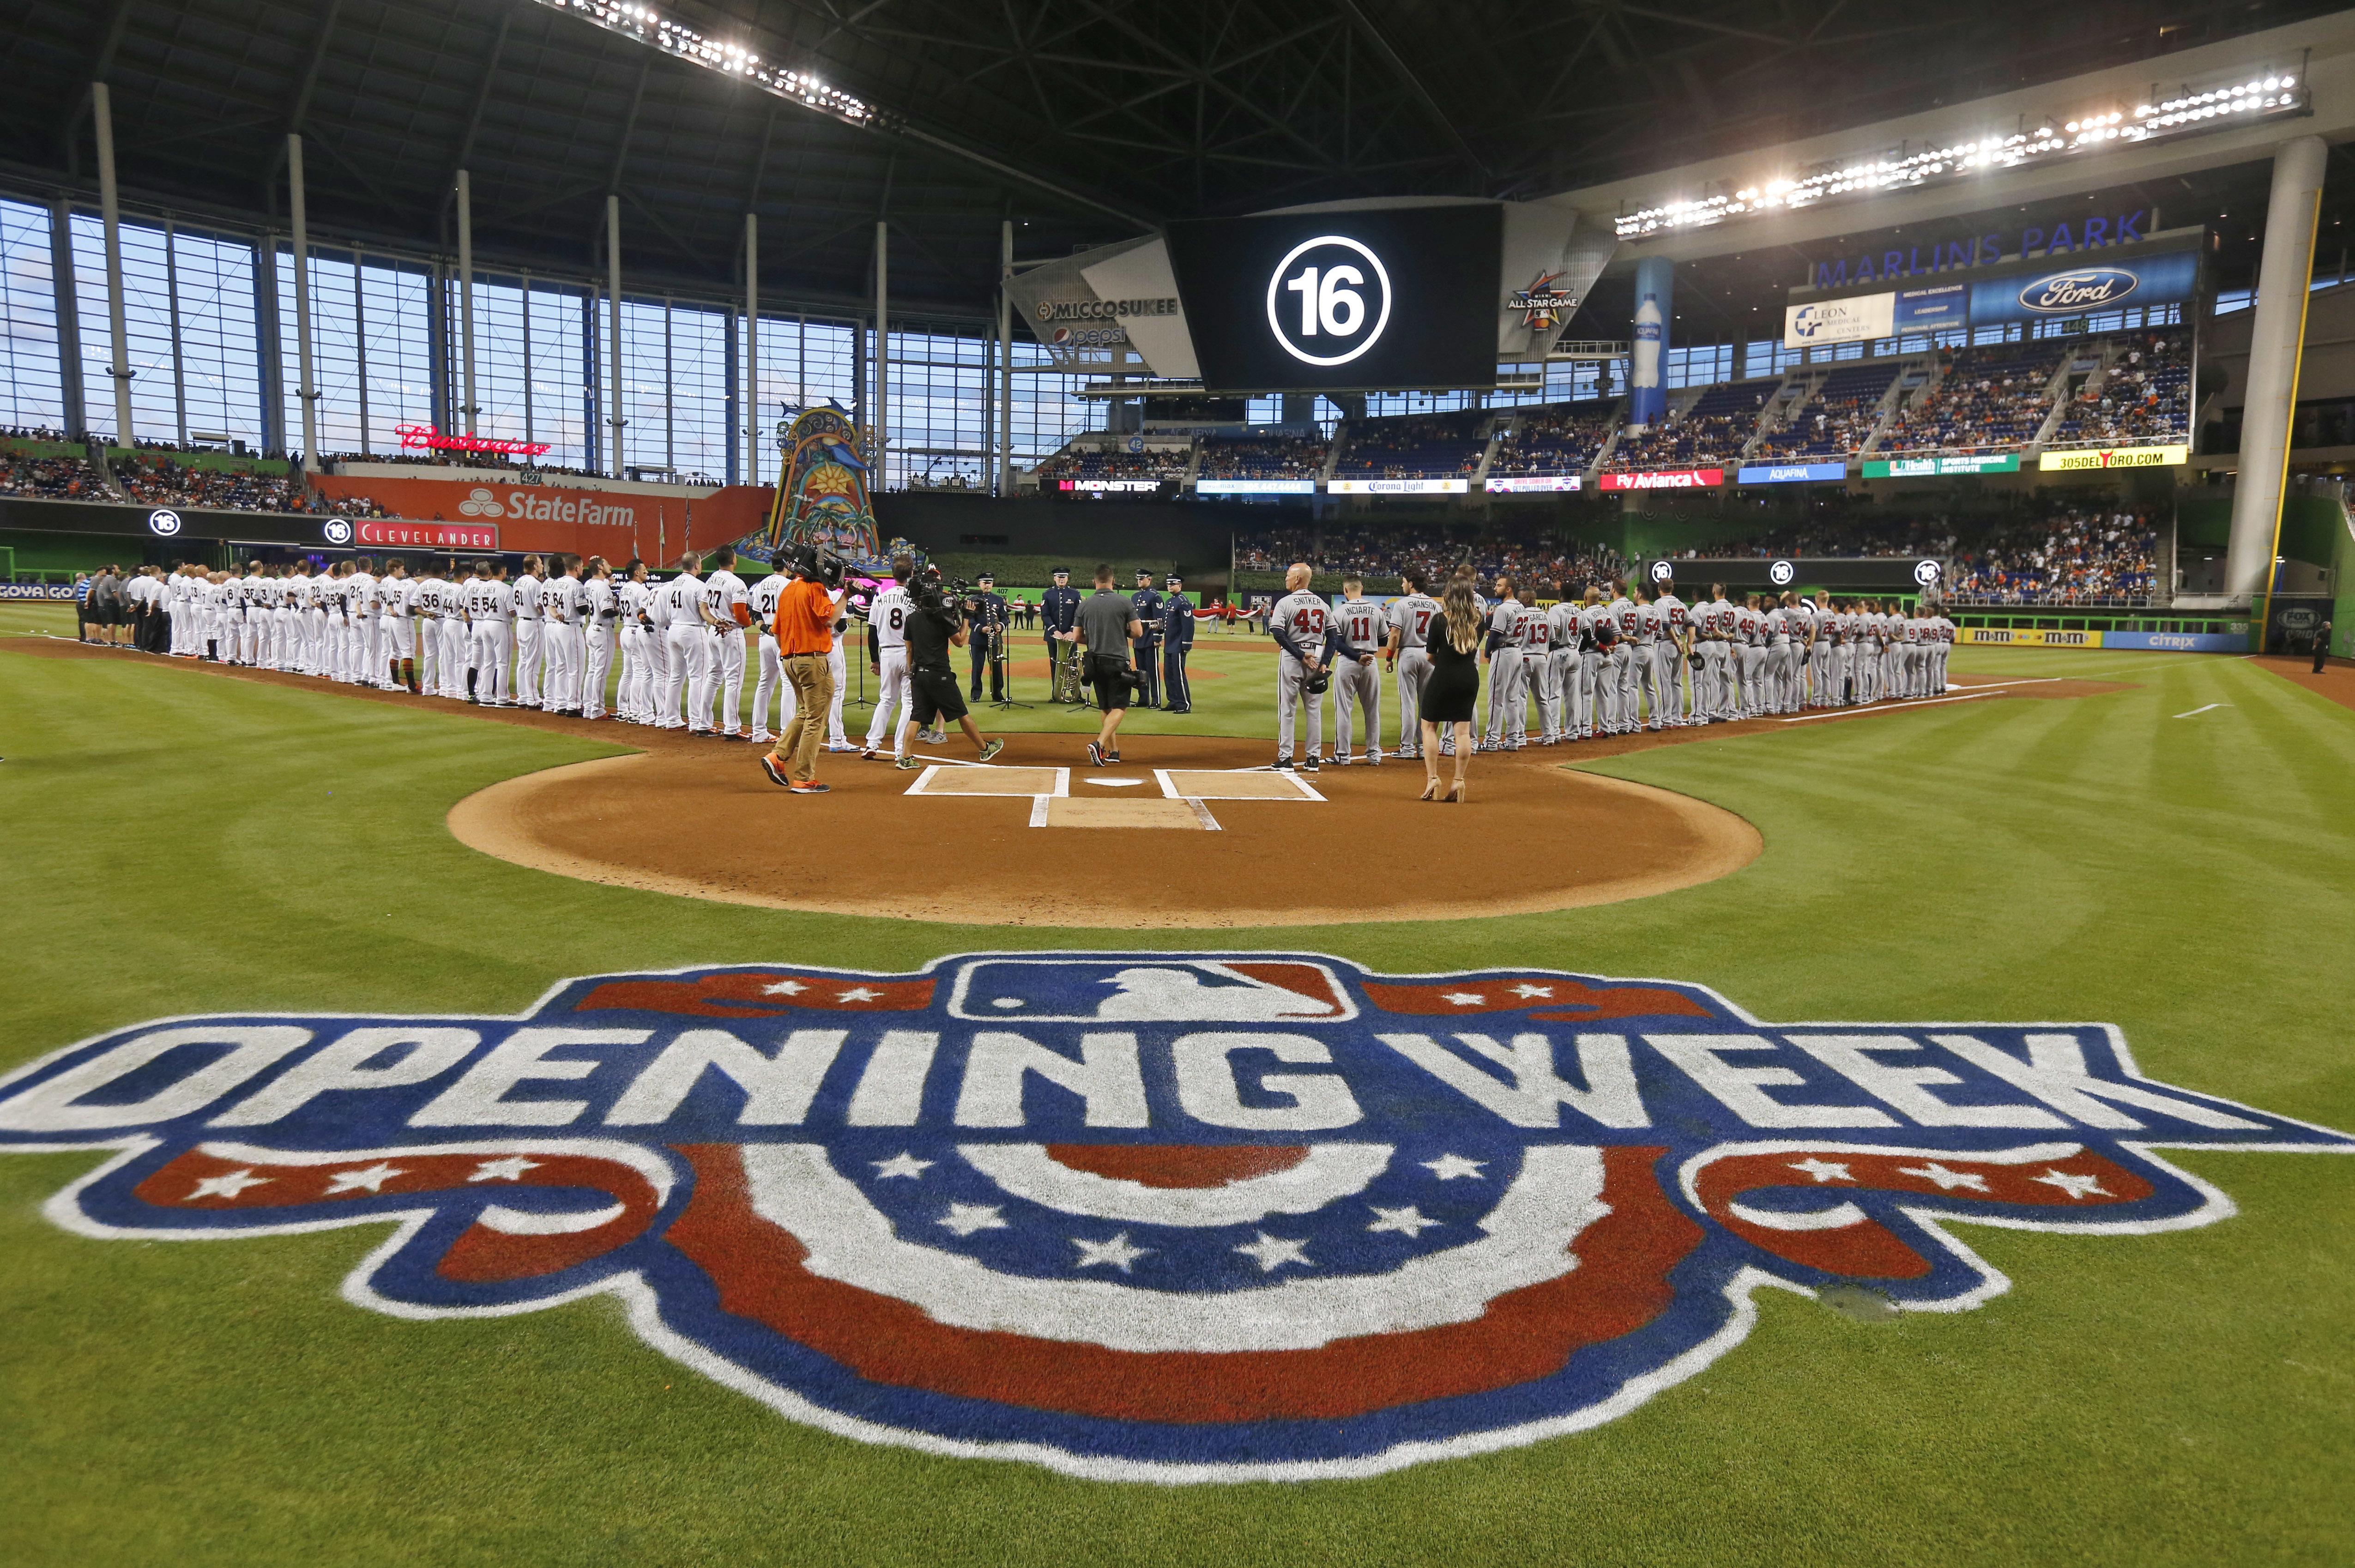 Braves_marlins_baseball_69956